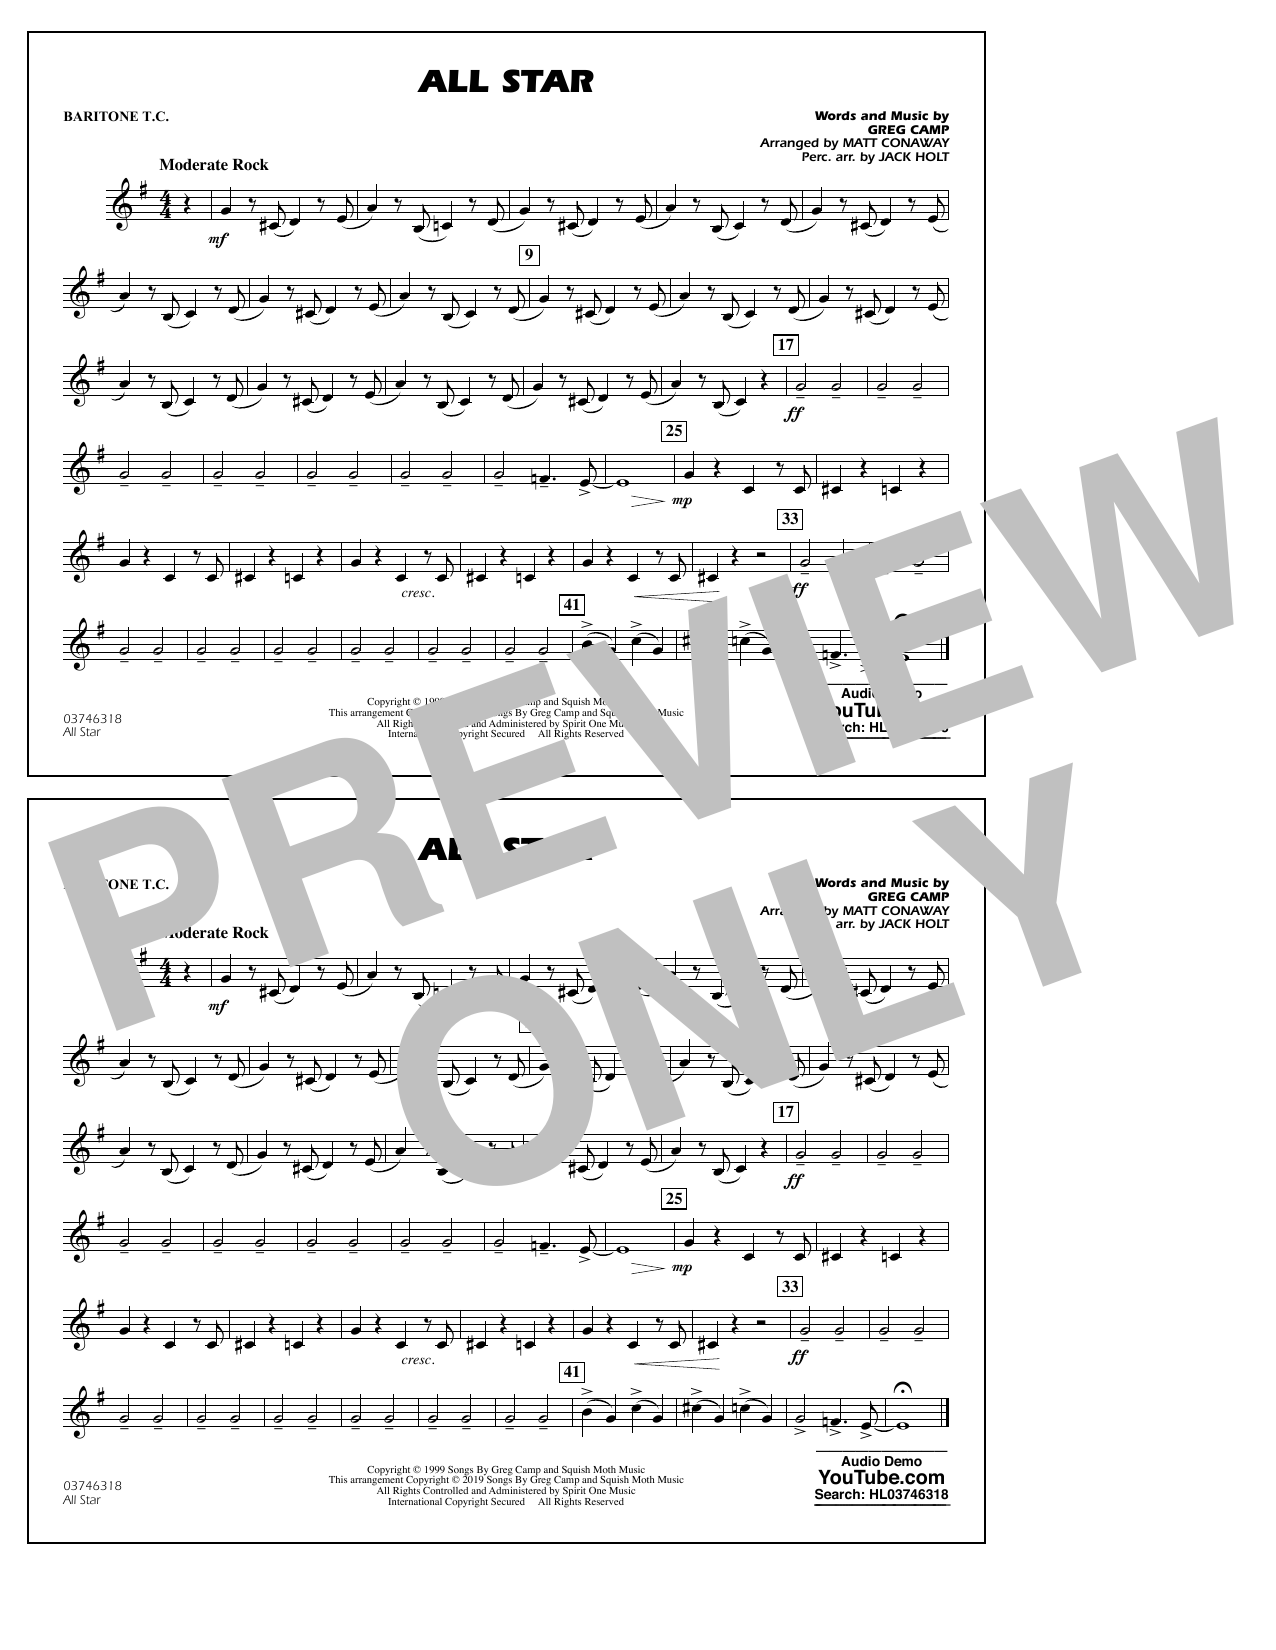 All Star (arr. Matt Conaway) - Baritone T.C. (Marching Band)